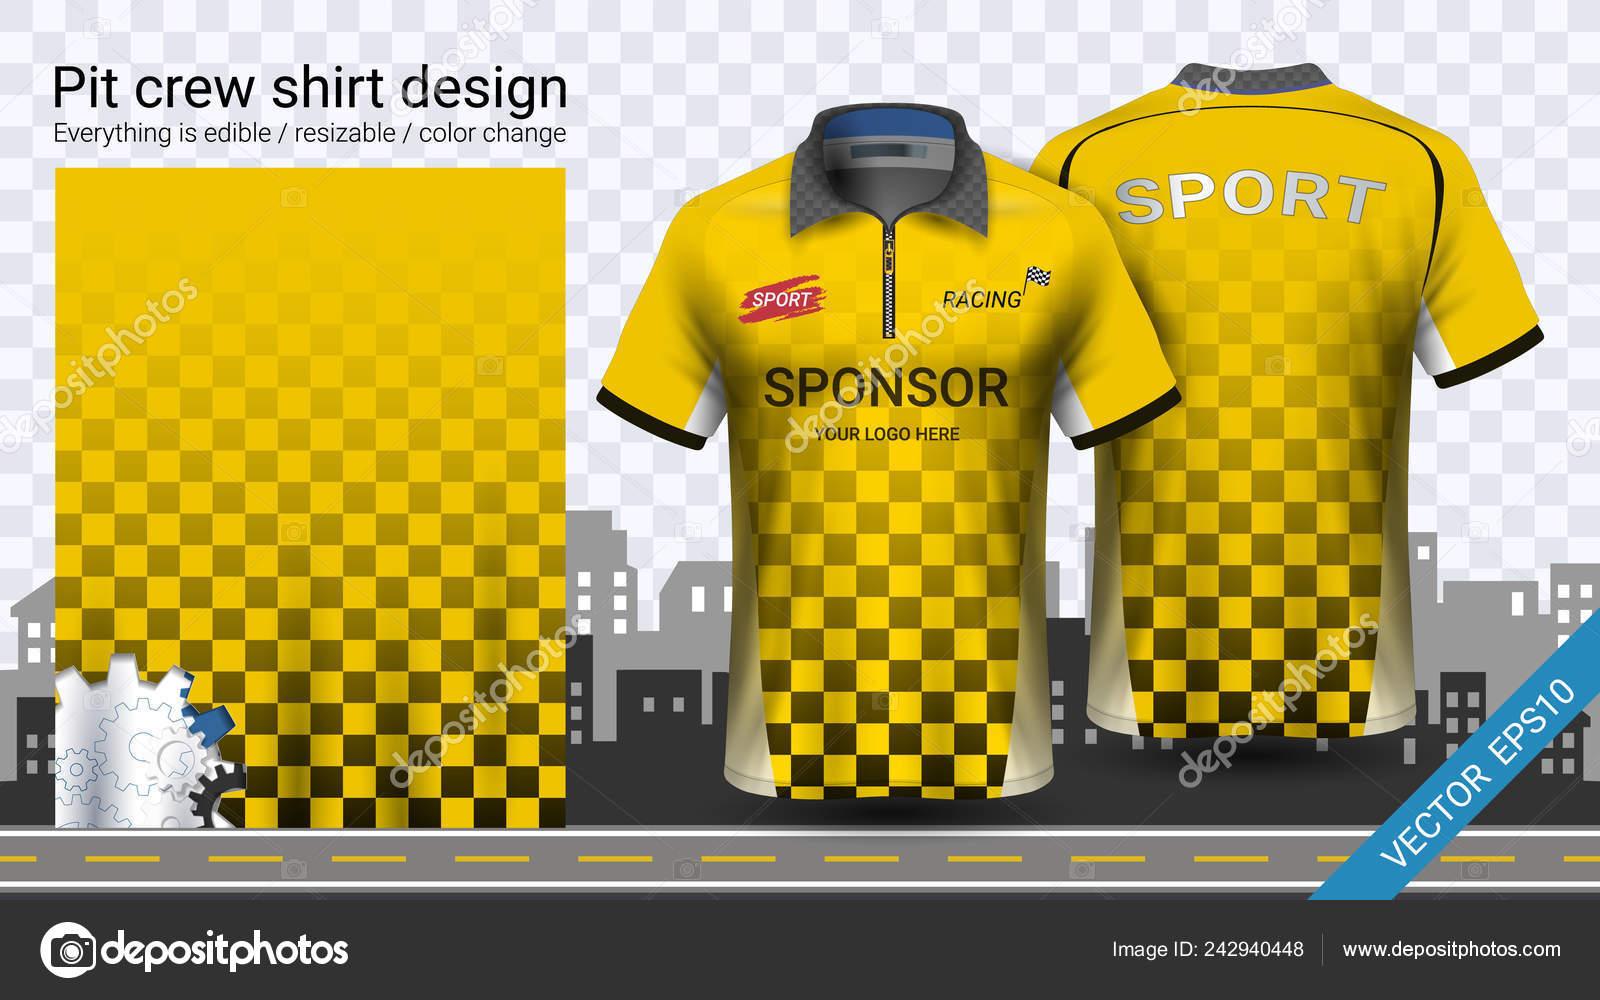 Polo Shirt Zipper Racing Uniforms Mockup Template Active Wear Sports Stock Vector C Aioonrak Gmail Com 242940448